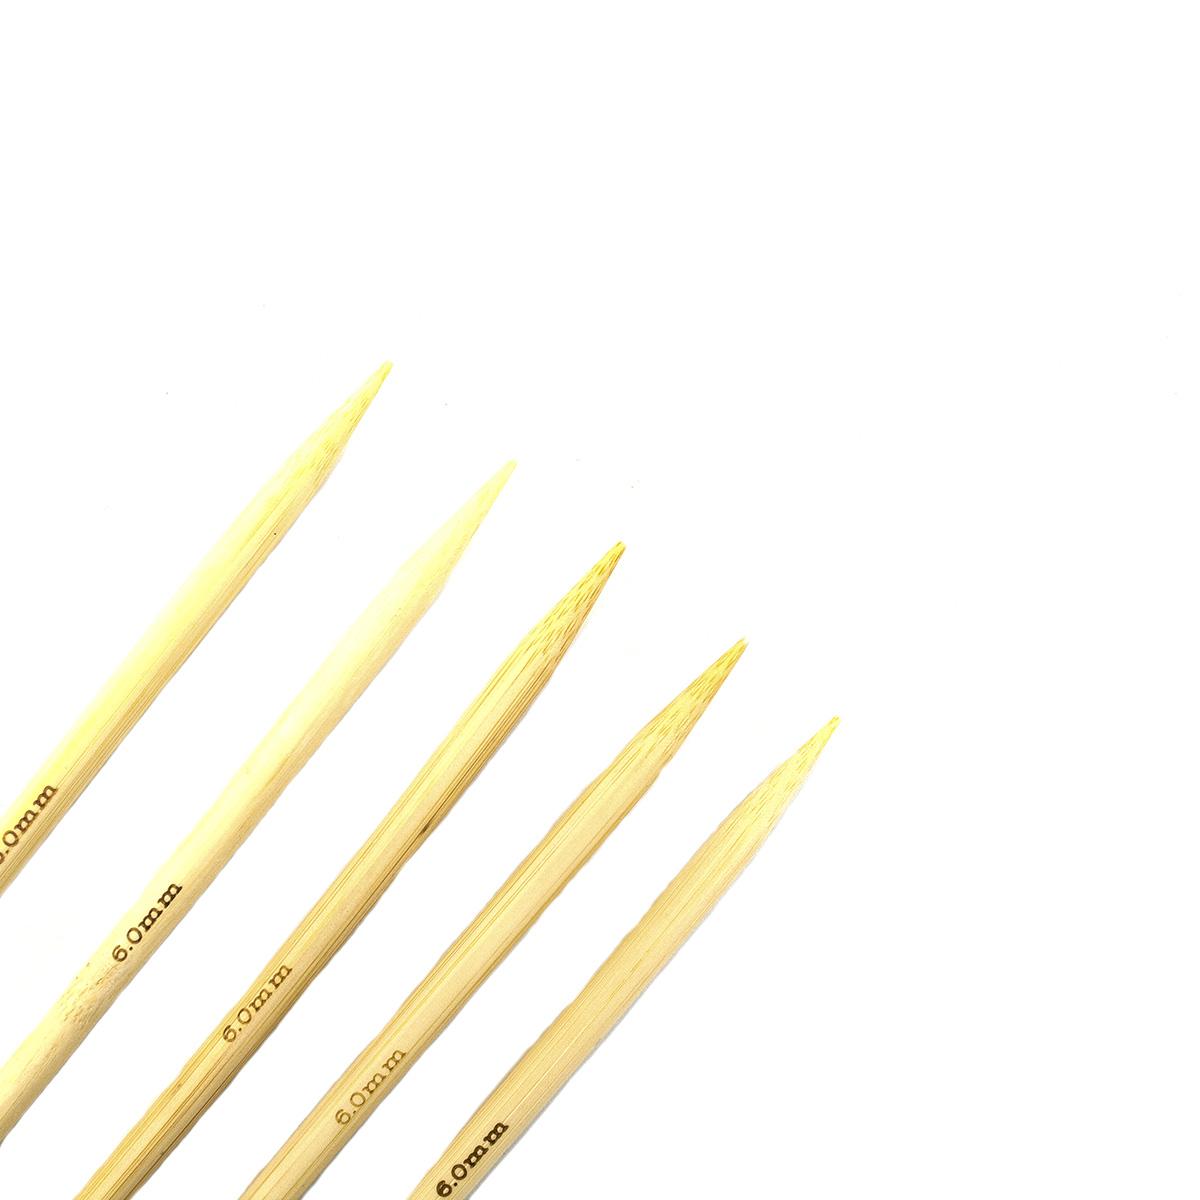 Спицы носочные бамбук, 20 см, 6,0 мм (942560), Hobby&Pro